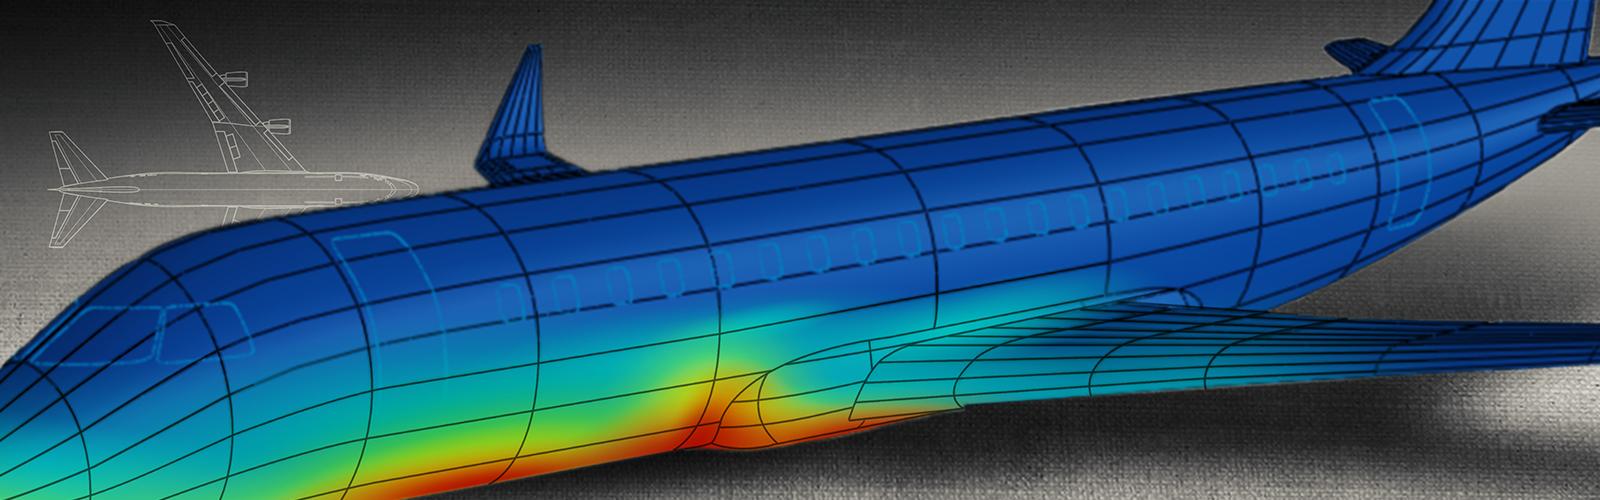 Non-linear Modeling - Finite Element Method   TU Delft Online